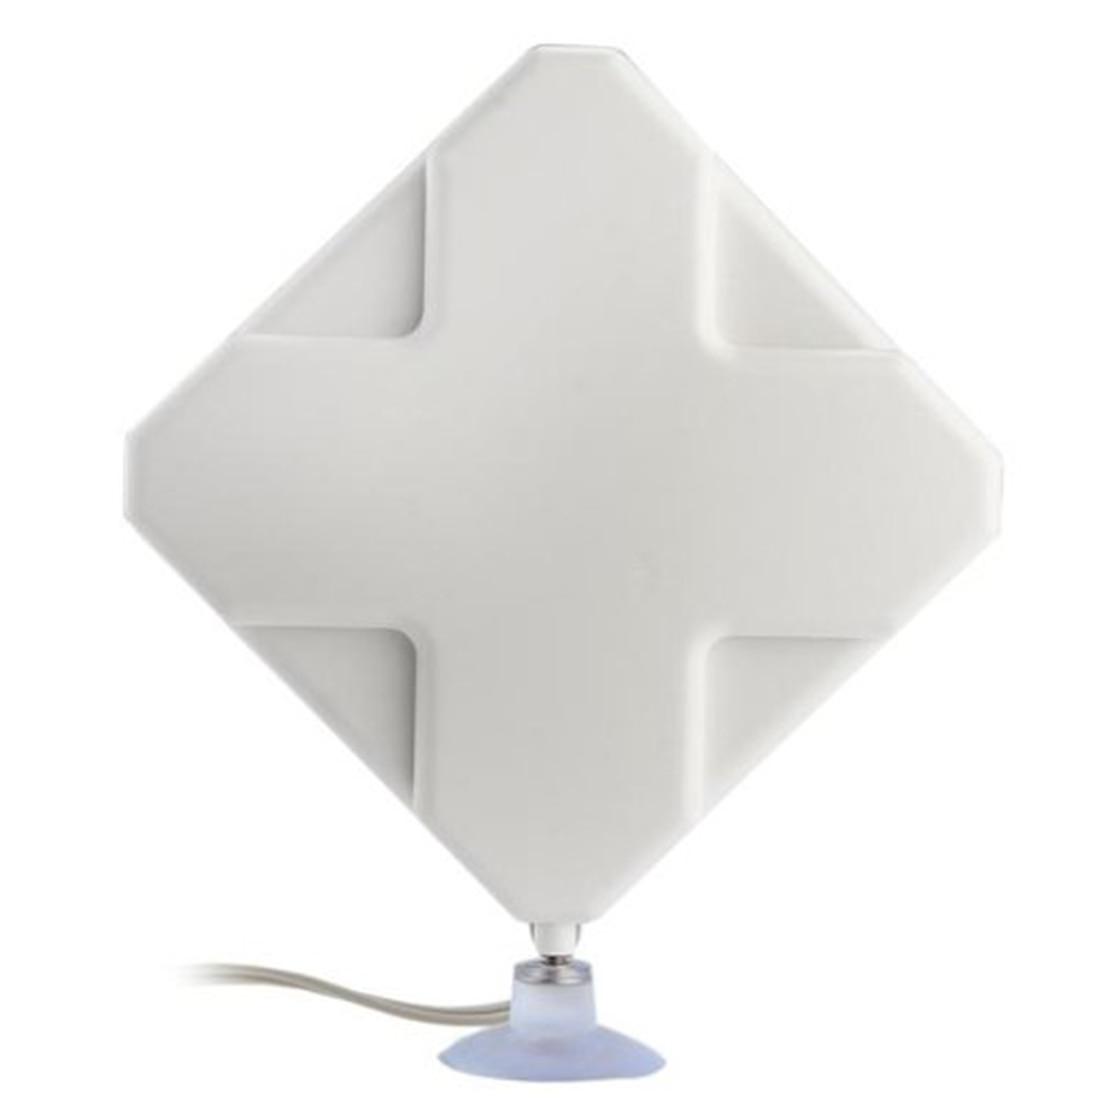 Etmakit 4g antena CRC9 conector 35dBi Antena de banda ancha amplificador de señal para 3G 4G LTE móvil